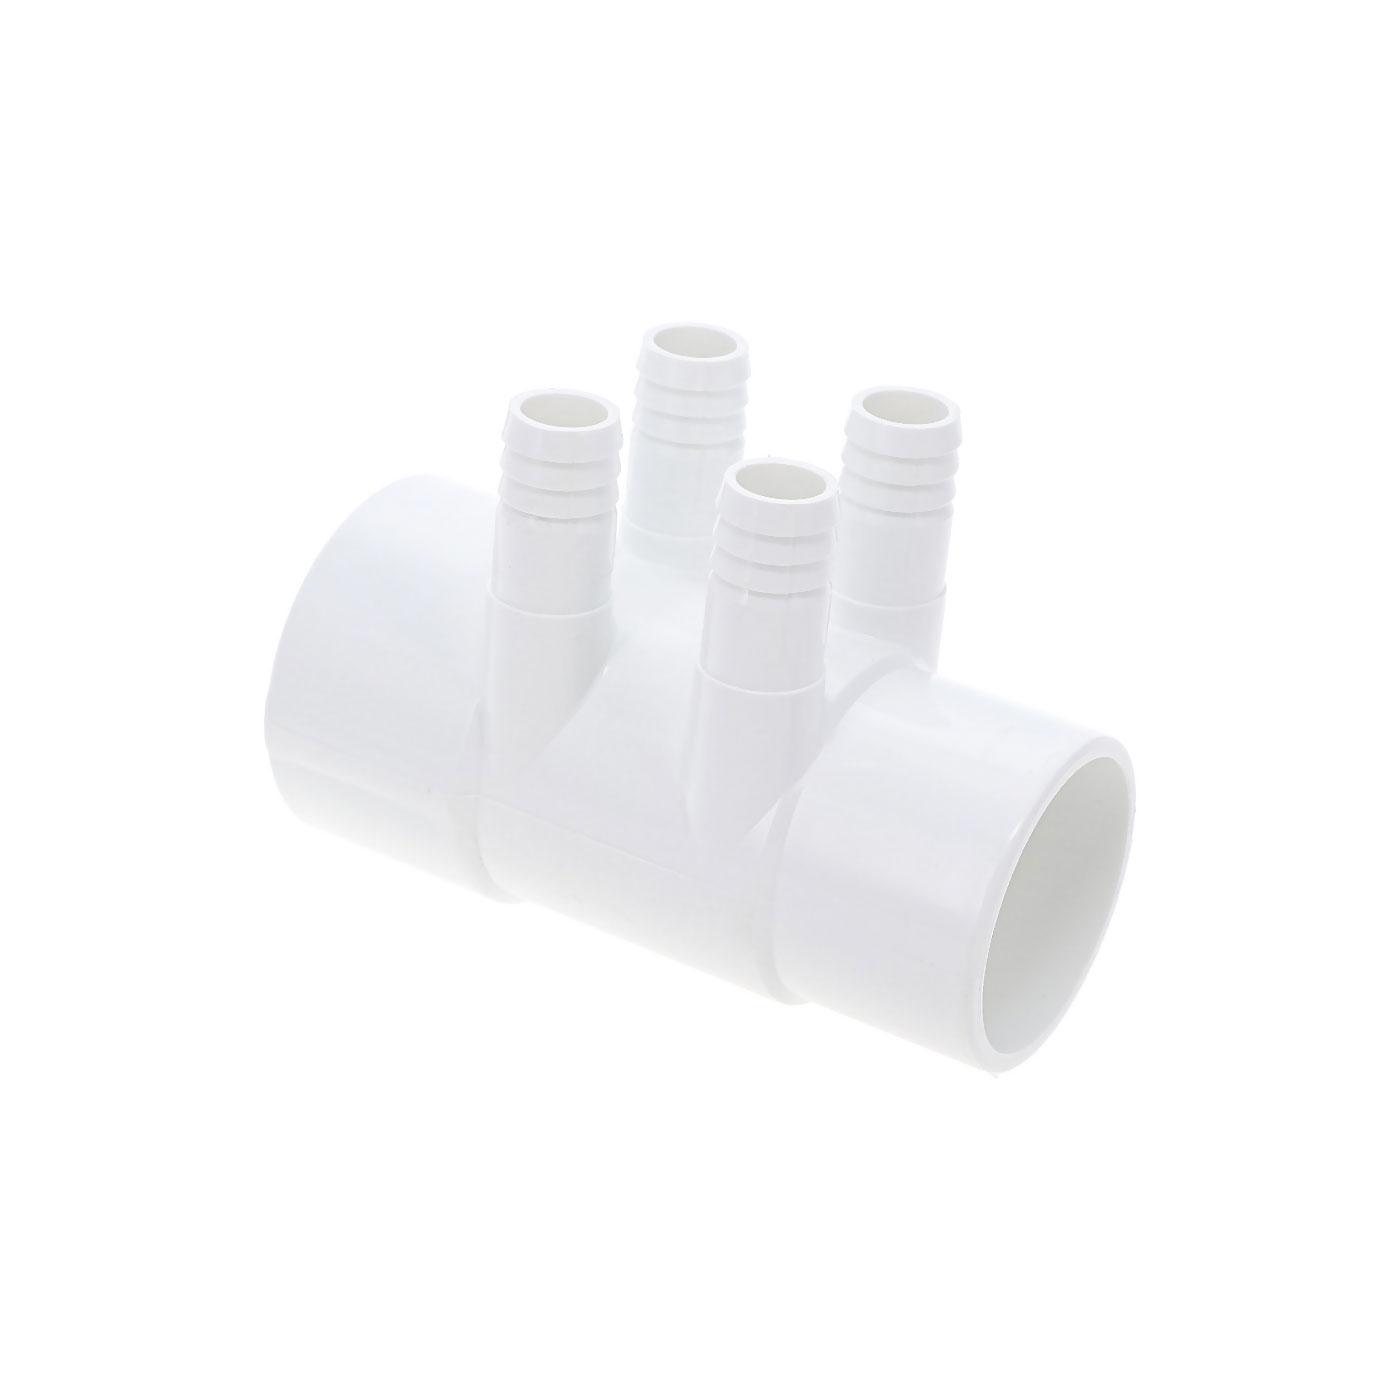 2'' F/M Manifold - 4 ribbed ports 3/4'' M